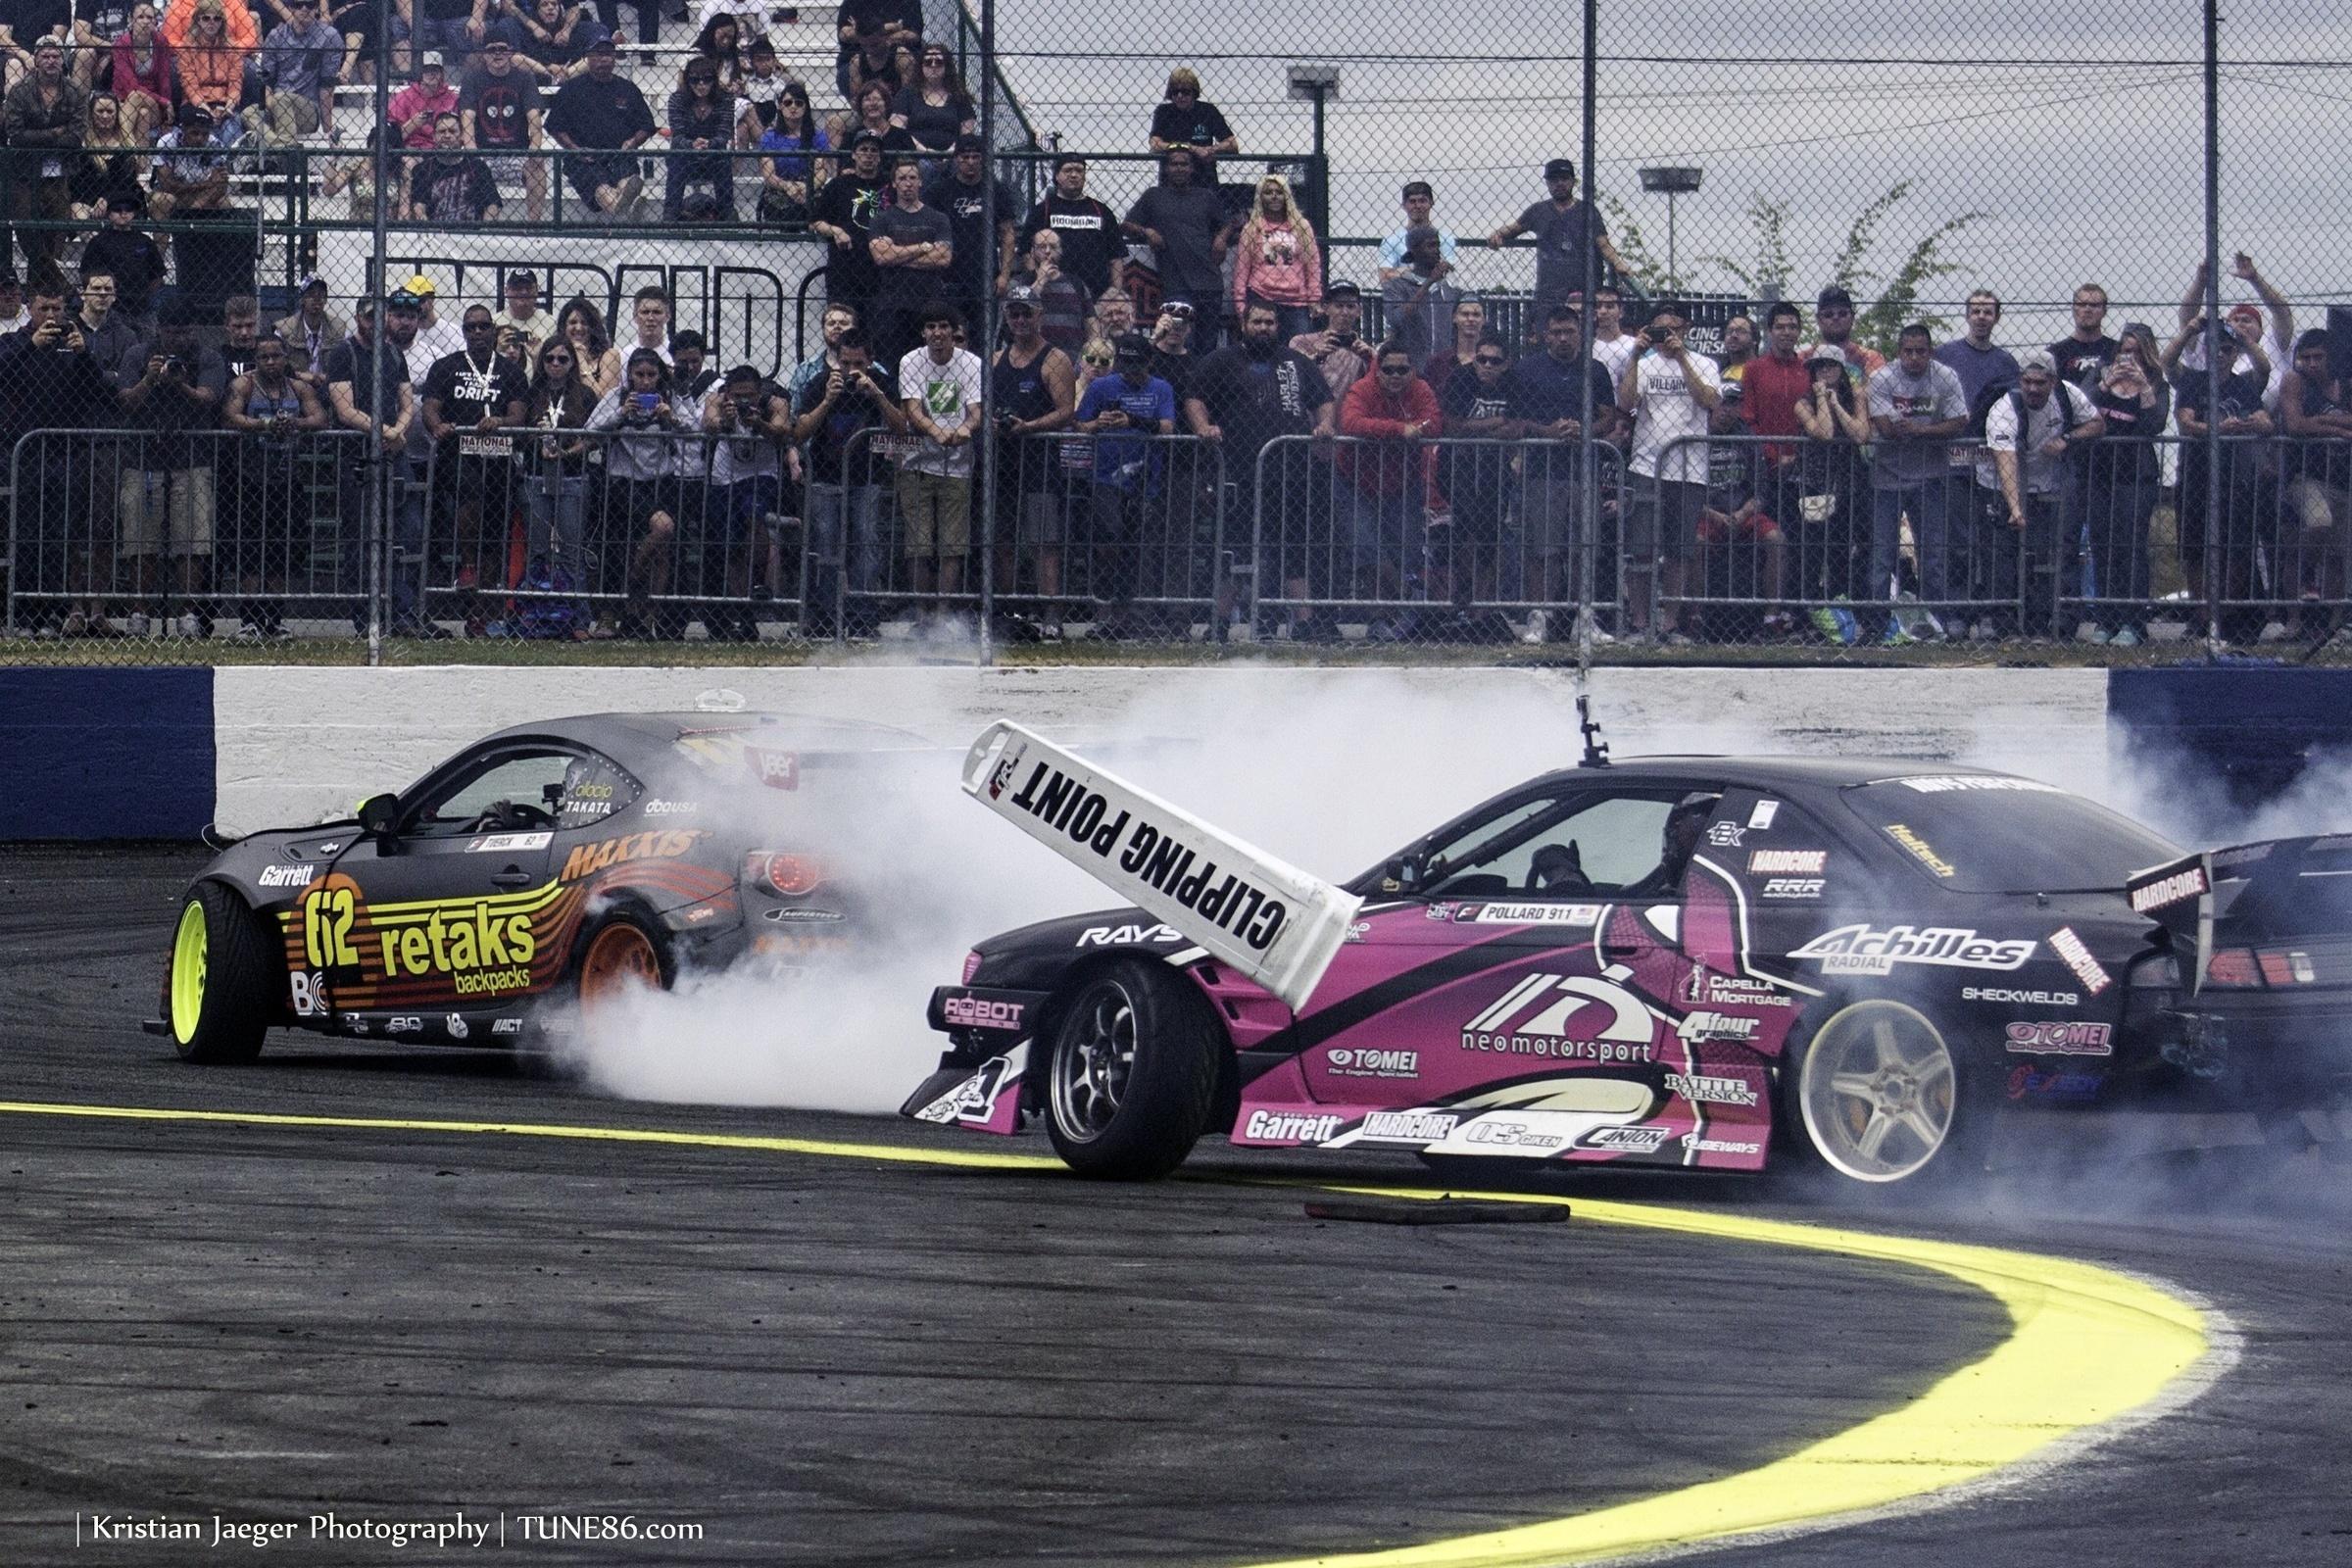 Formula Drift Seattle Ryan Tuerck 2jz FRS06